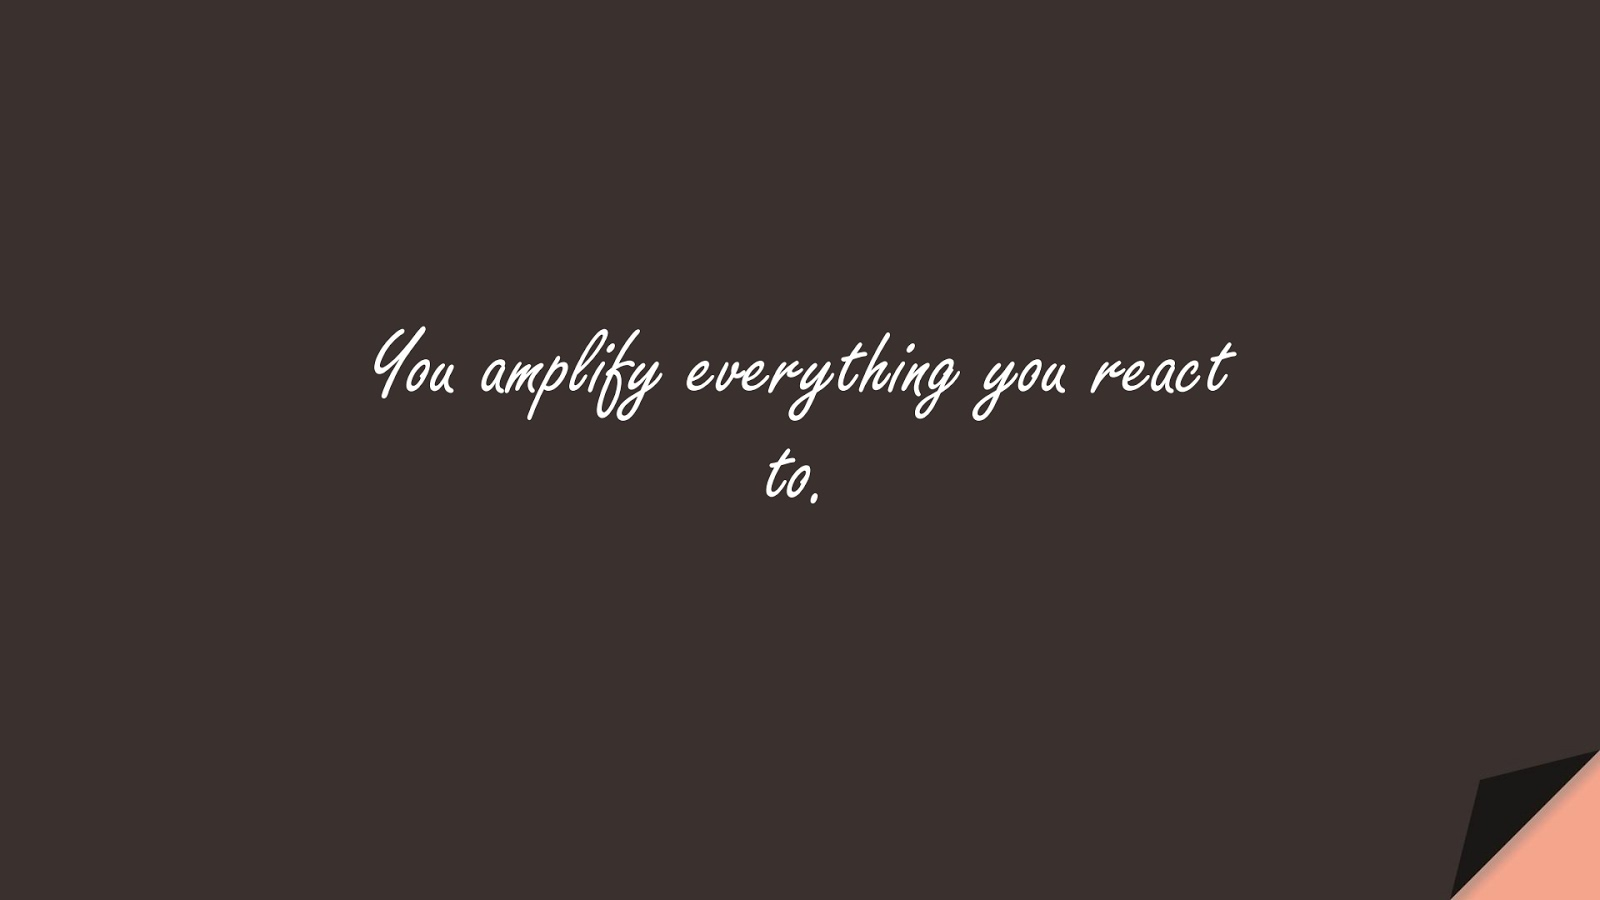 You amplify everything you react to.FALSE